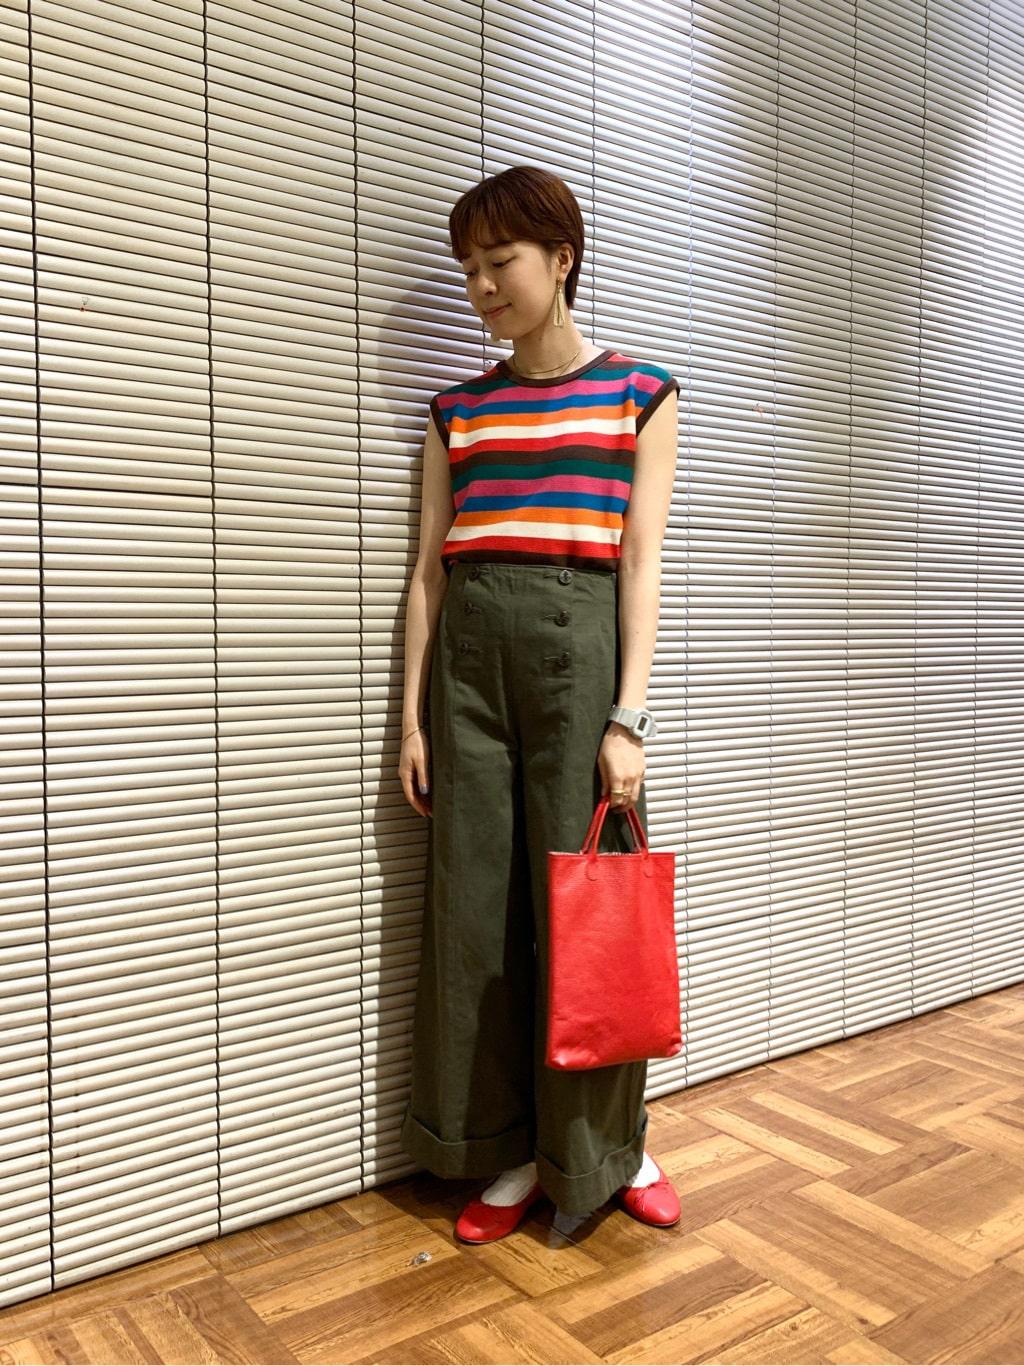 AMB SHOP CHILD WOMAN CHILD WOMAN , PAR ICI ルミネ横浜 身長:158cm 2020.07.21